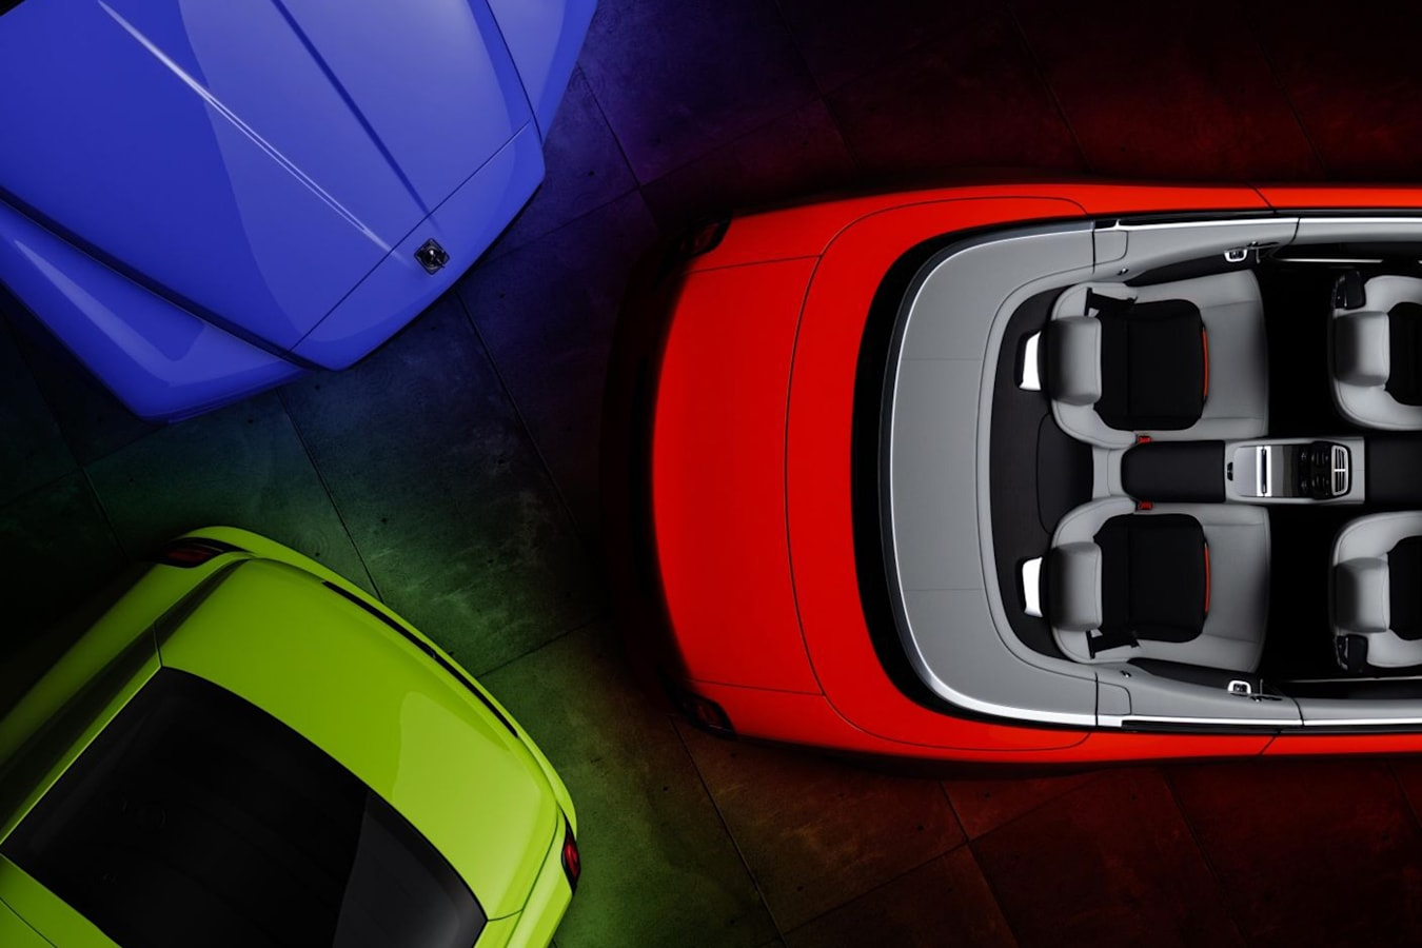 Rolls Royce neon